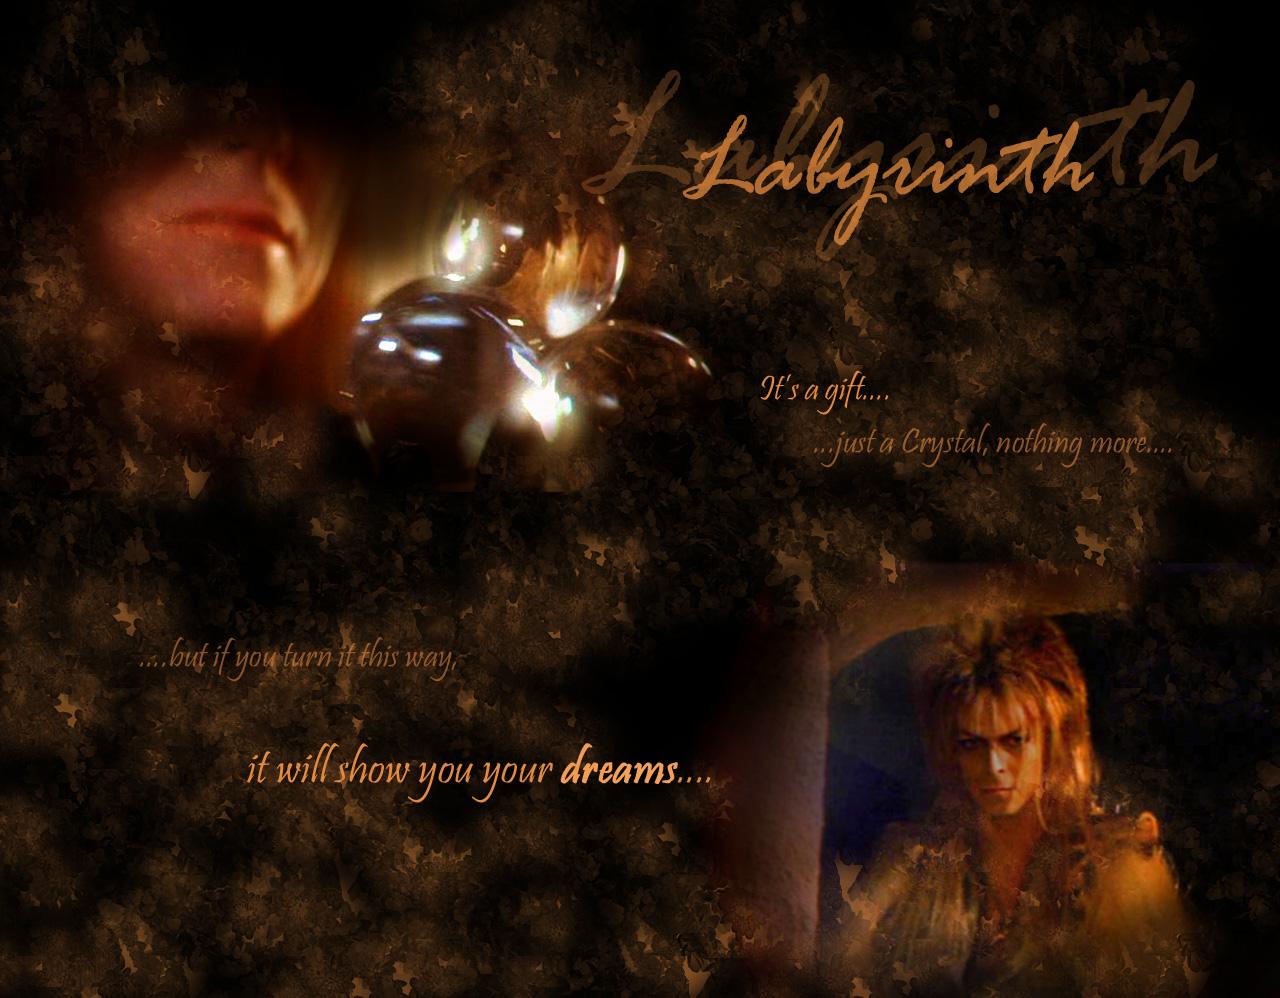 Labyrinth Wallpaper by Truro on DeviantArt Labyrinth Movie Wallpaper